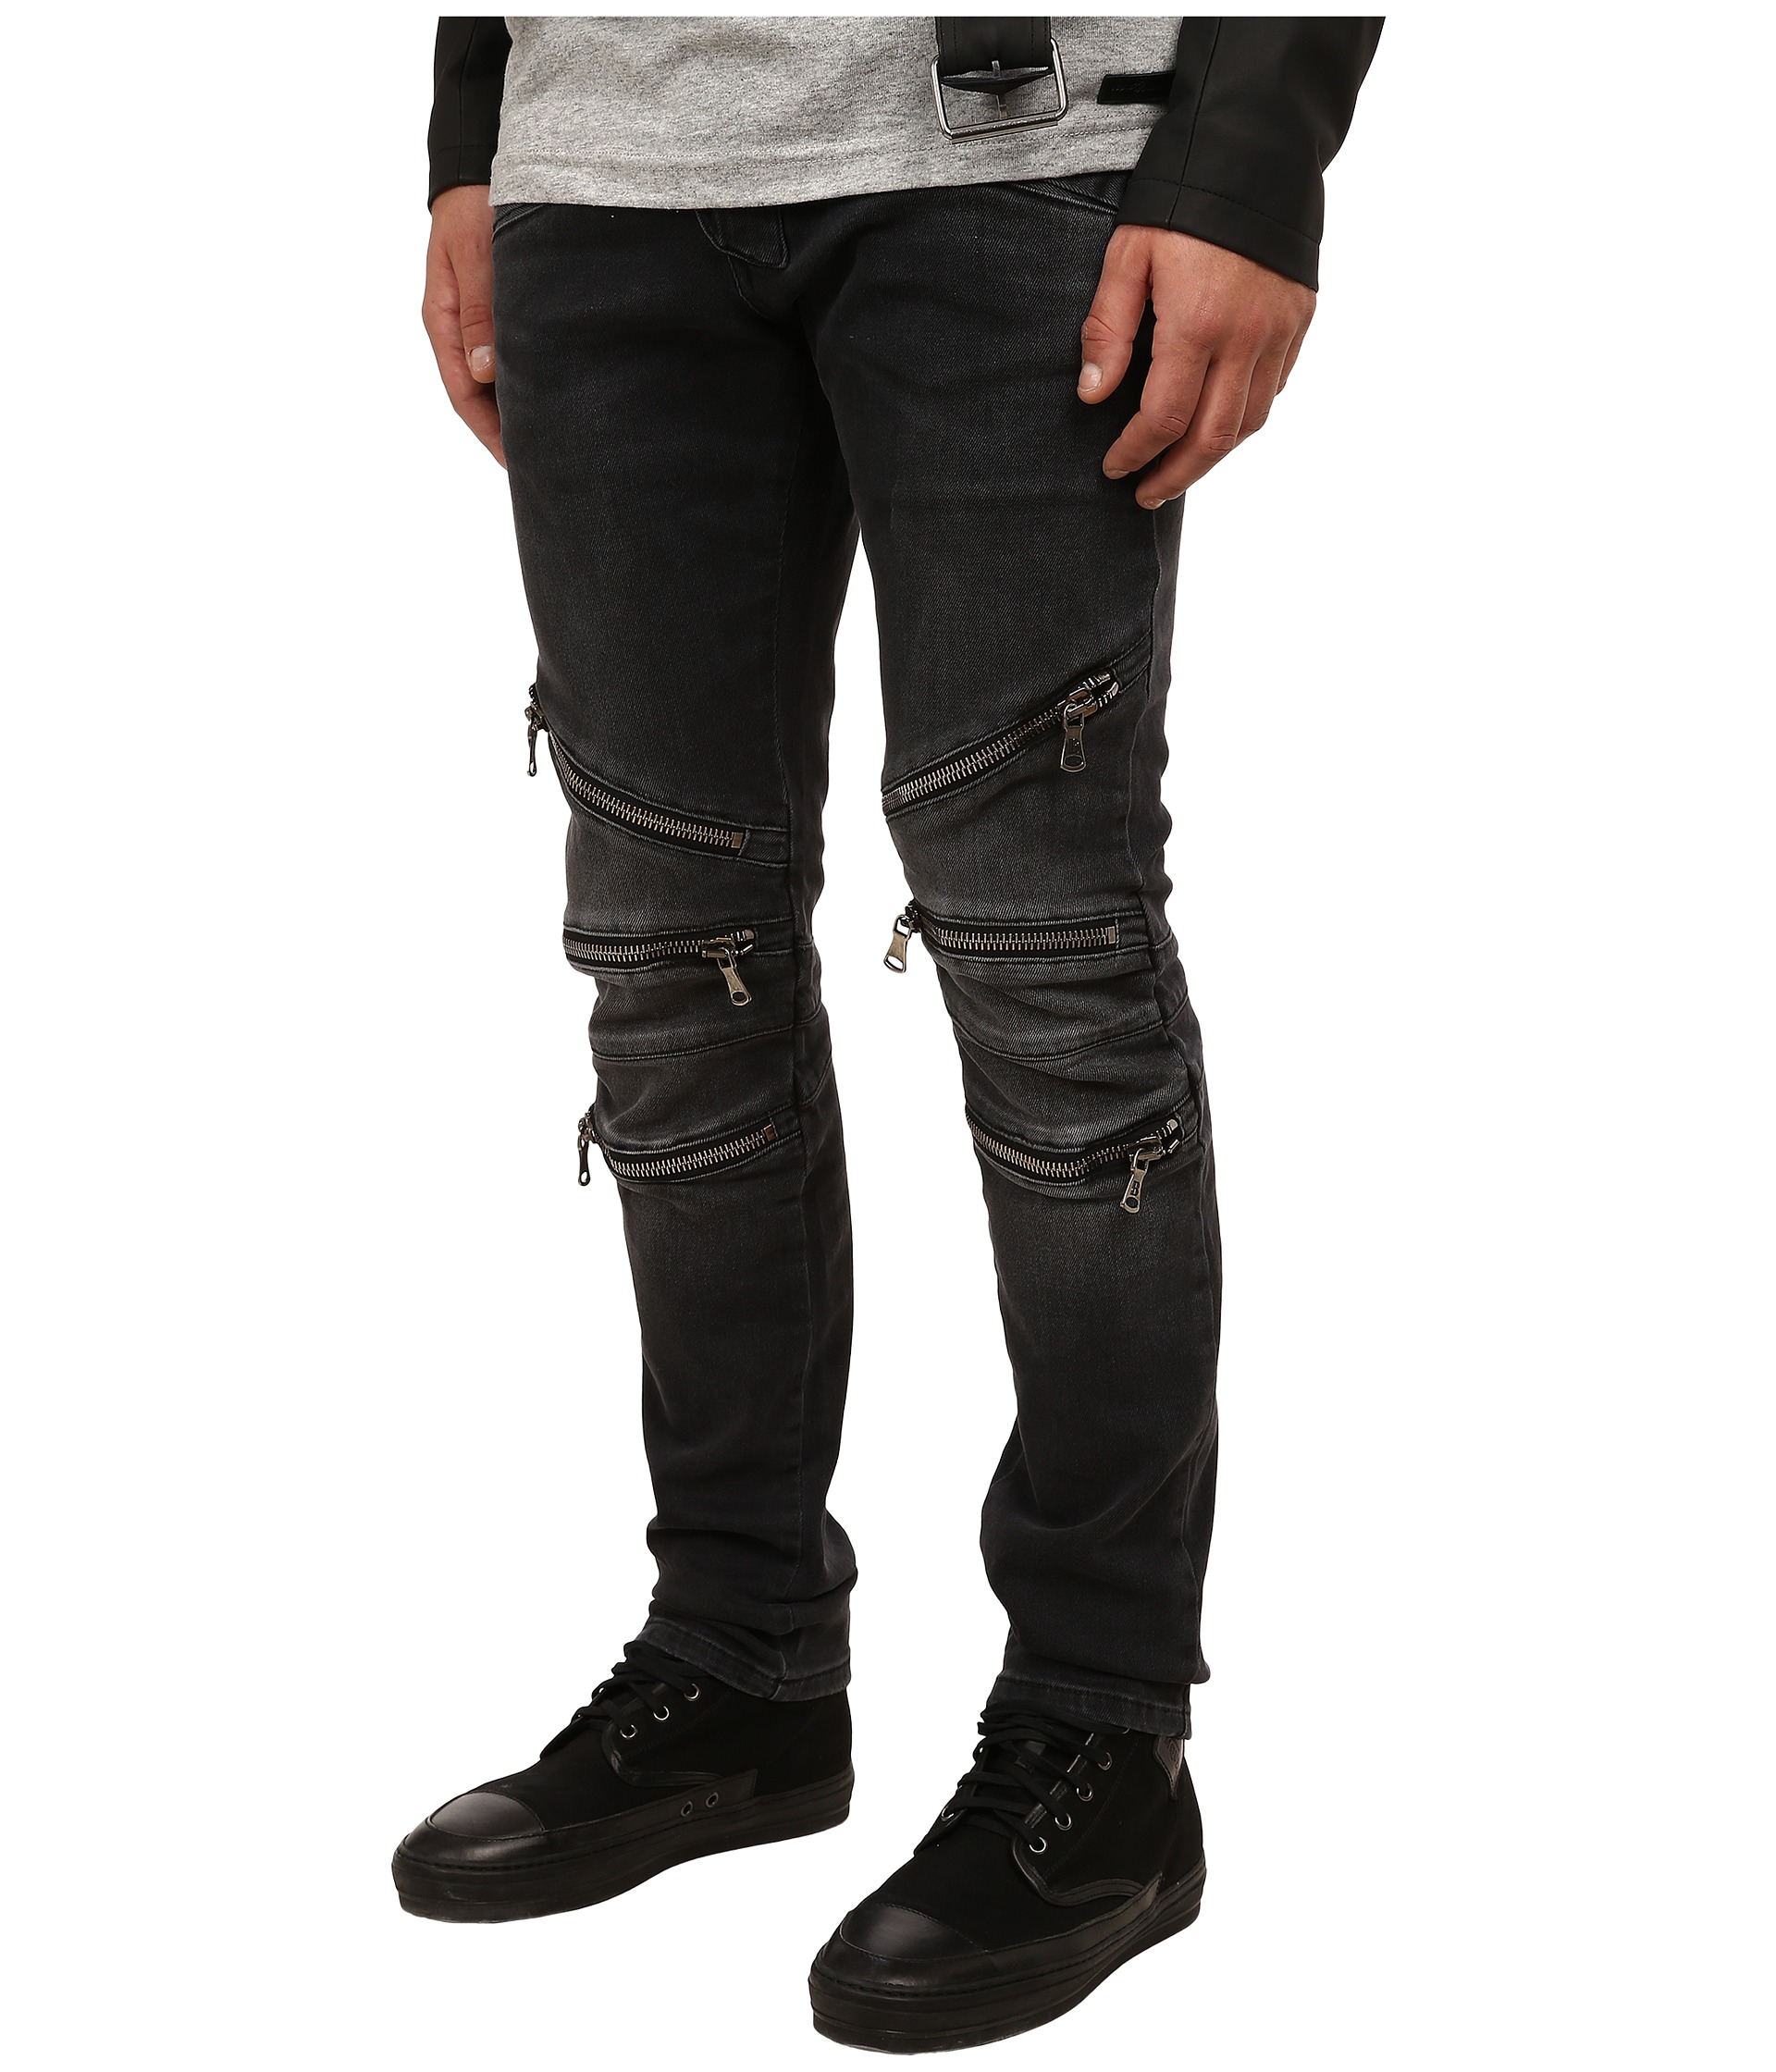 b130a6c88b6 Balmain Zipper Jeans in Black for Men - Lyst